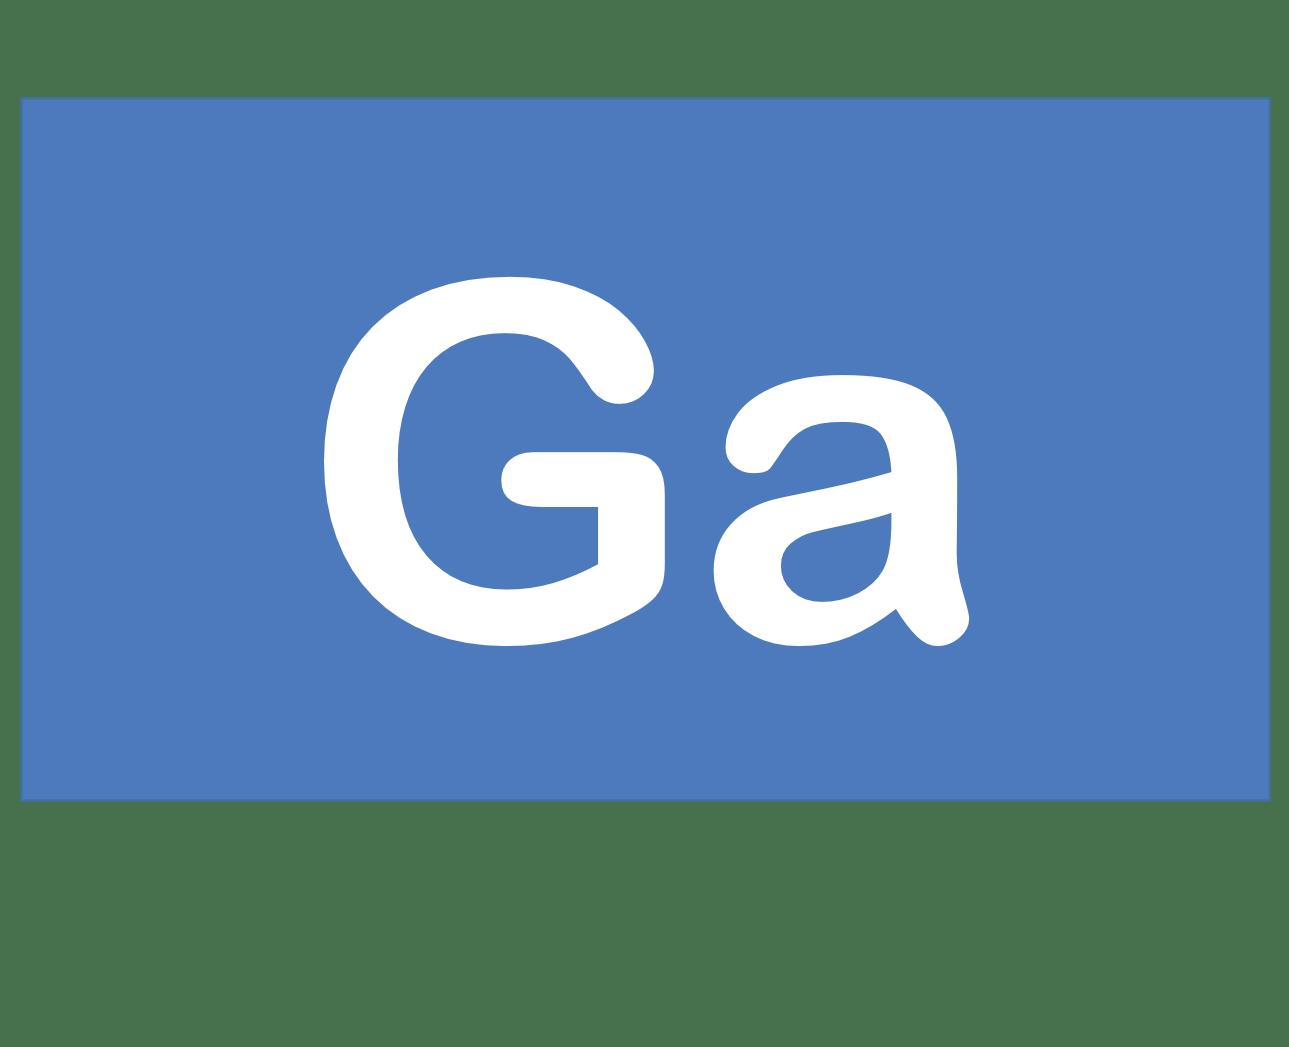 31 Ga ガリウム Gallium 元素 記号 周期表 化学 原子